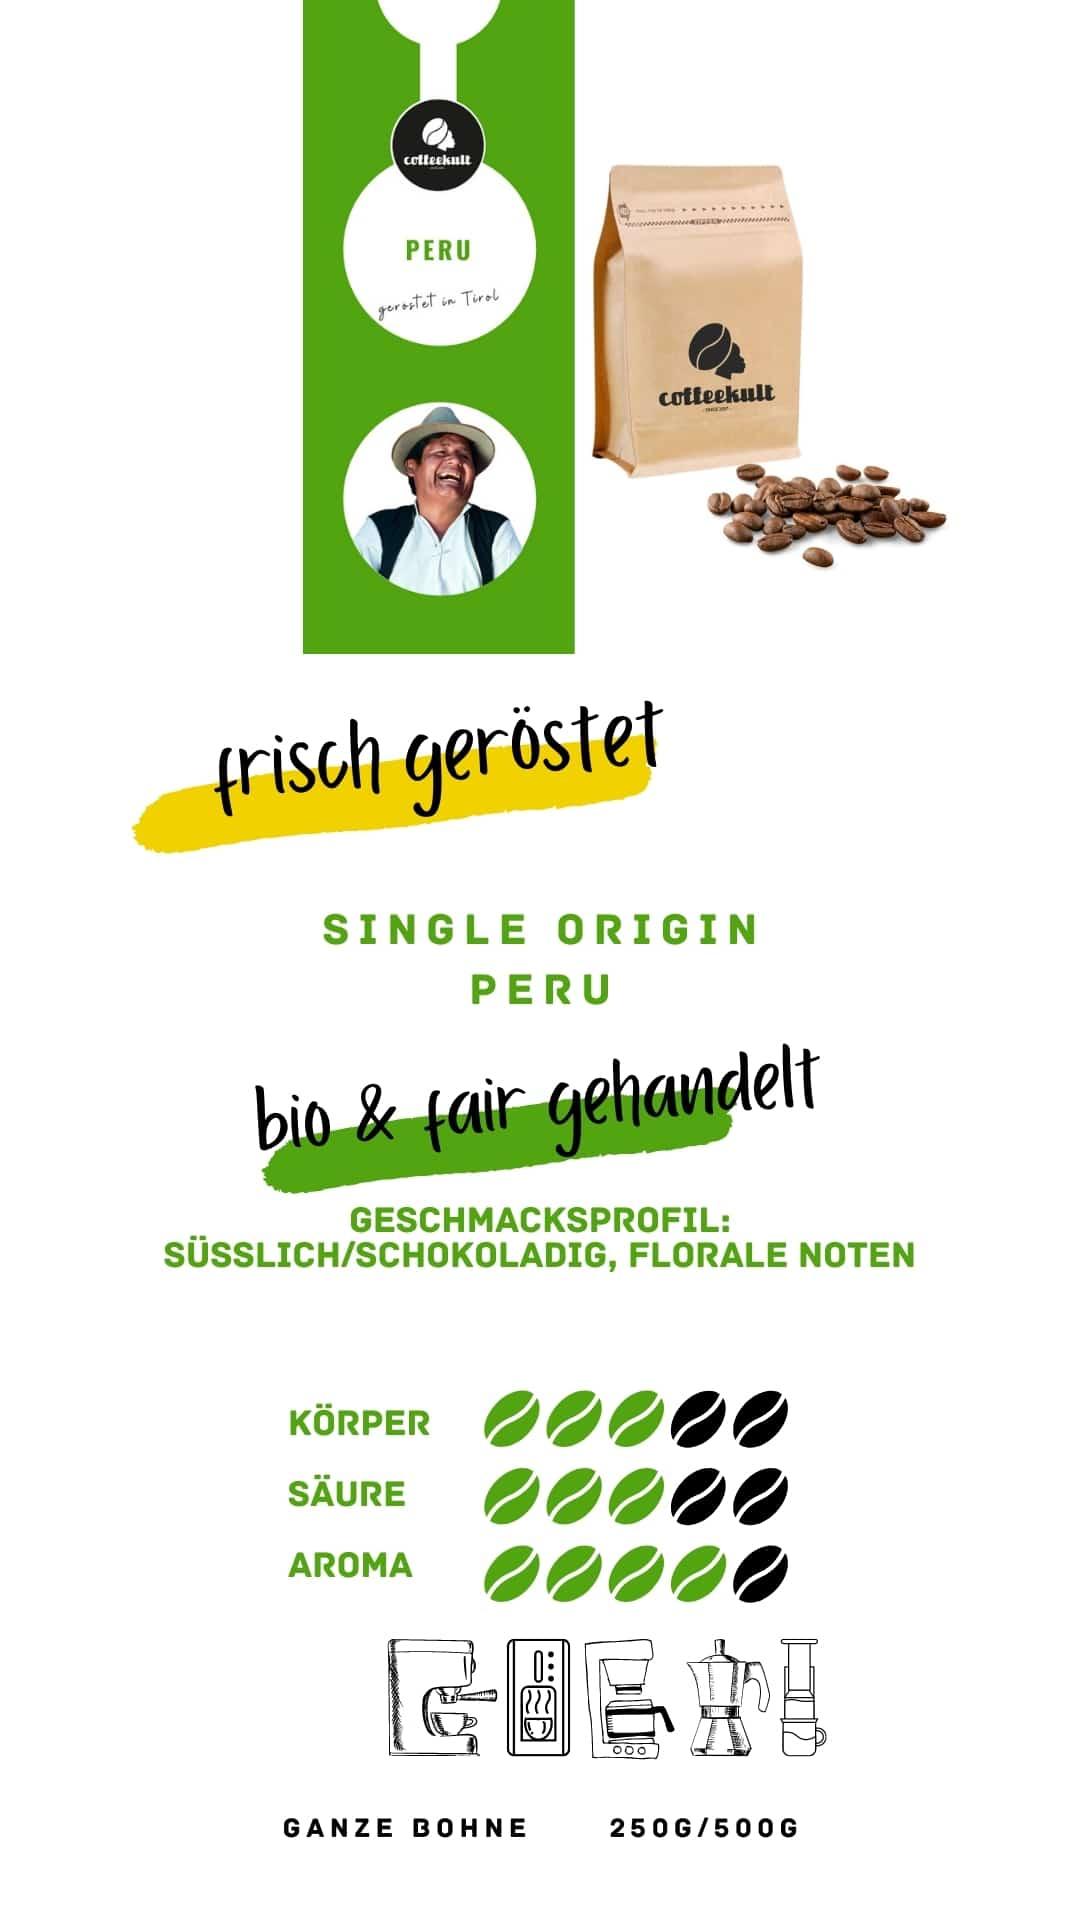 coffeekult coffee frisch geröstet barista kaffeerösterei innsbruck arabica bohnen peru